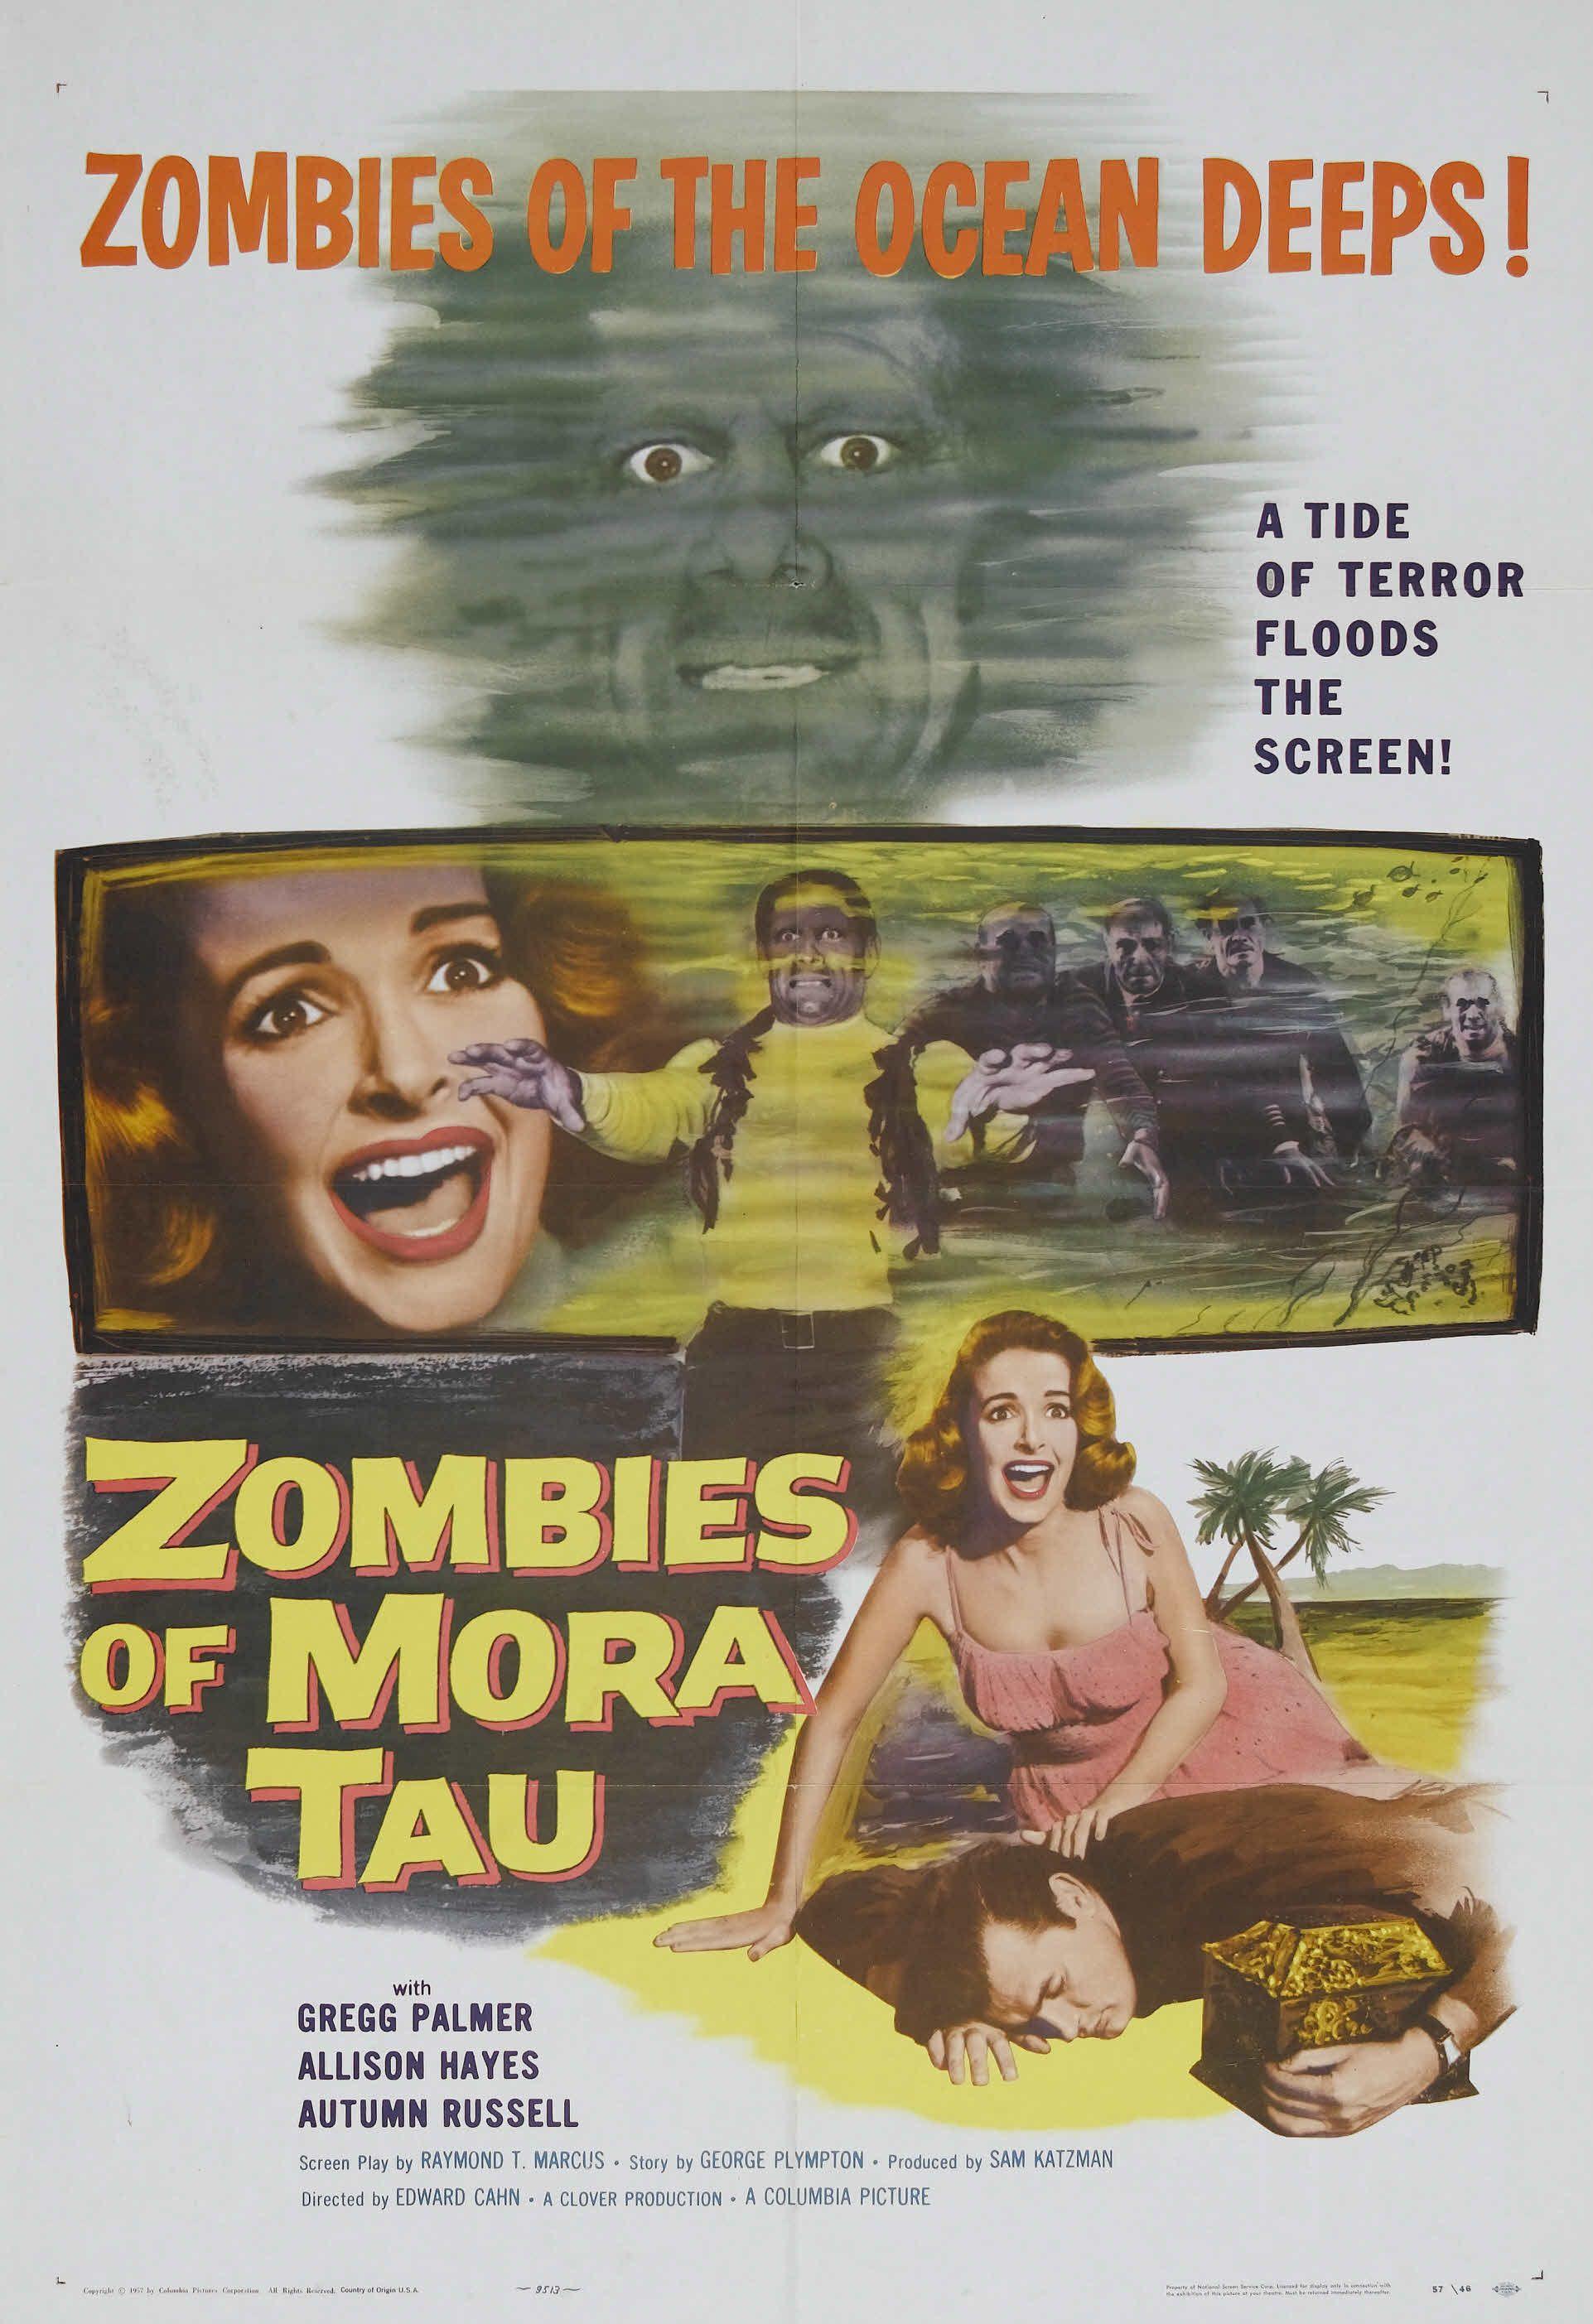 Zombies of Mora Tau Gregg Palmer Horror movie poster